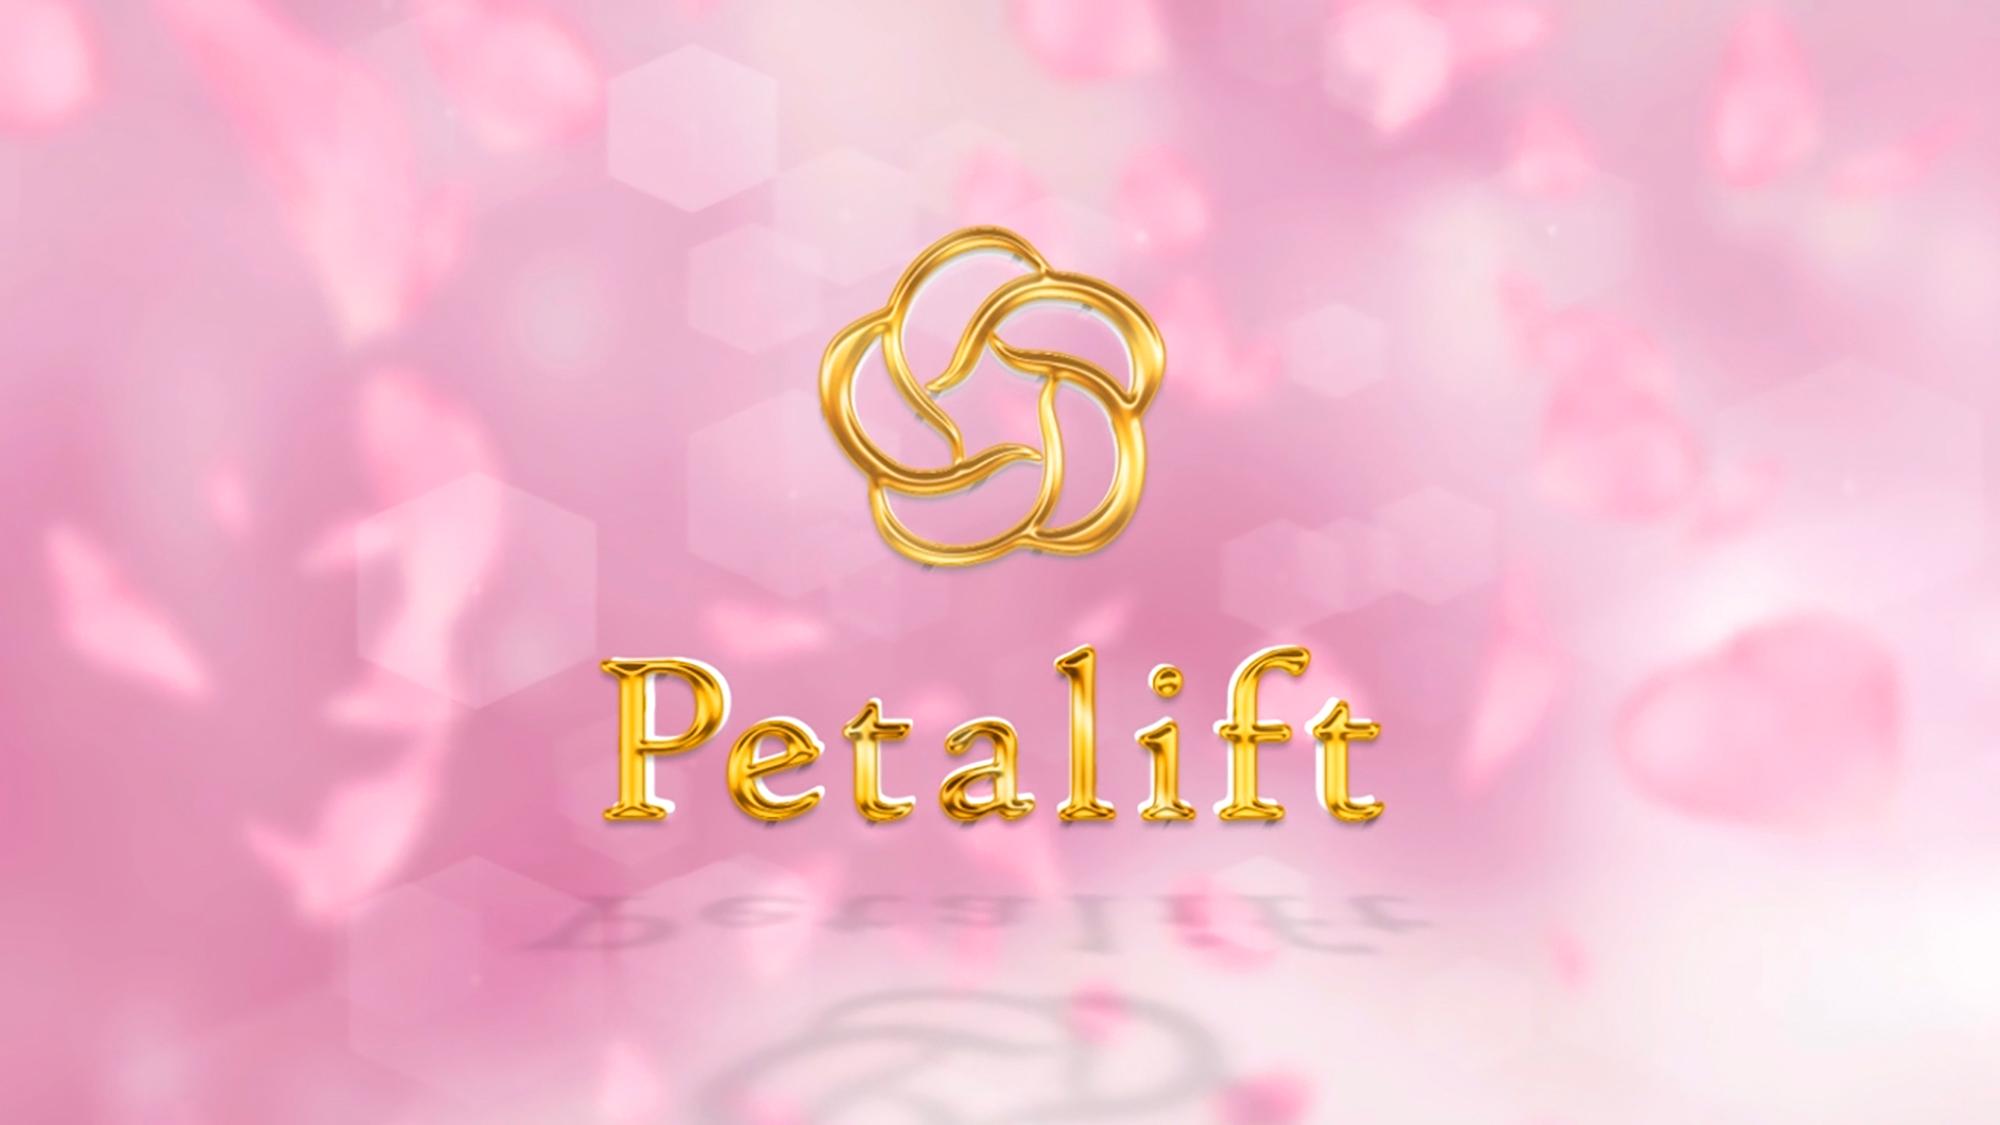 3D電動ケアローラー「Petalift」 プロモーションムービー